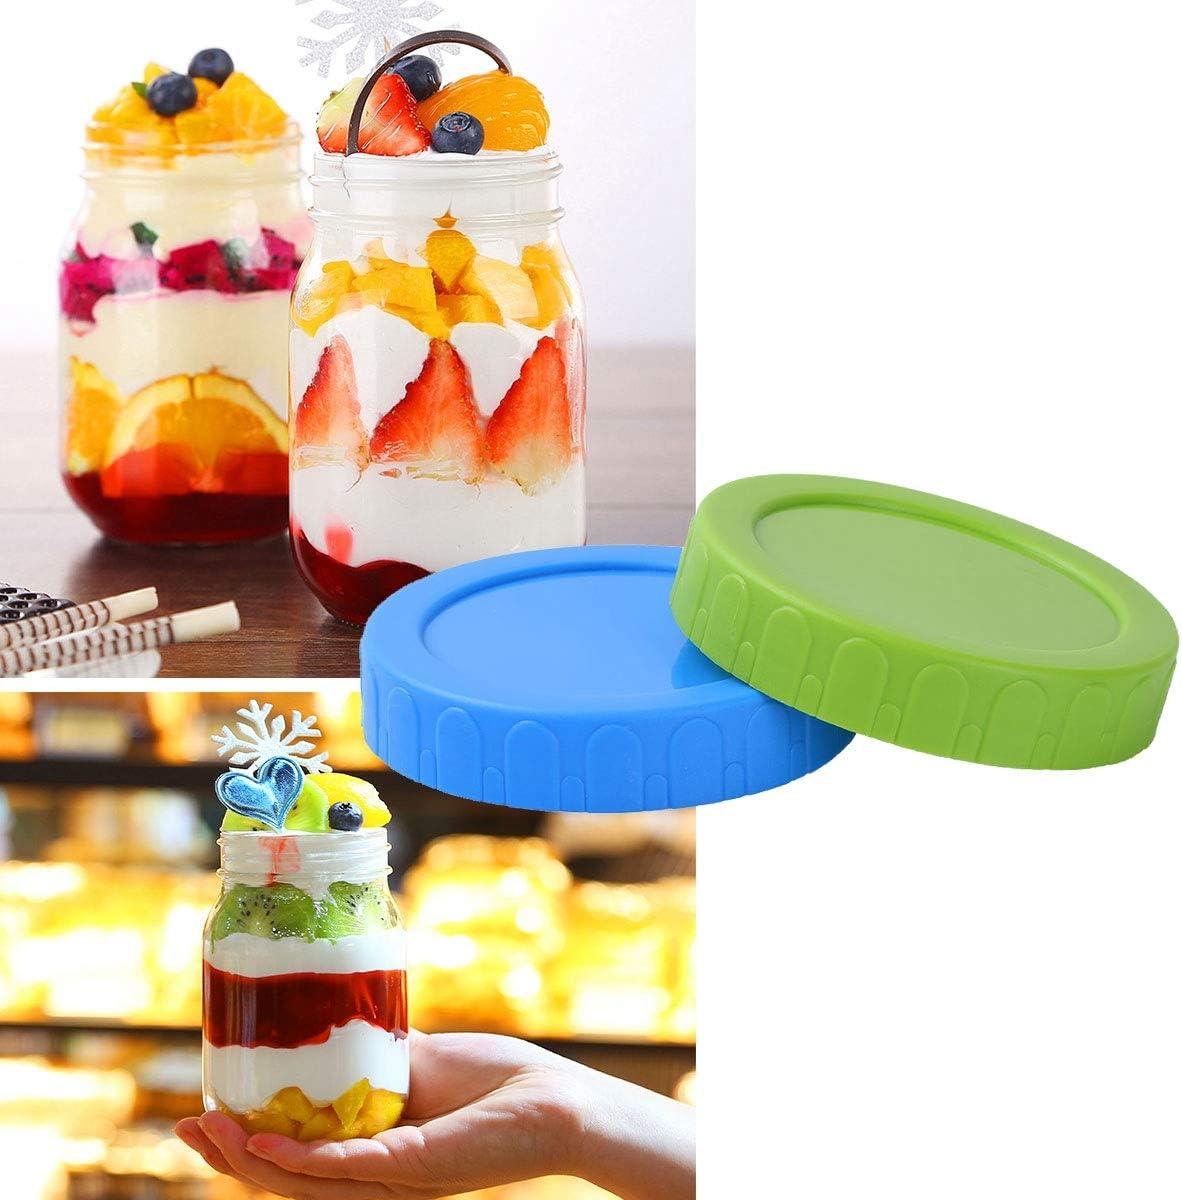 ACAMPTAR Tapas de almacenamiento para tarros de boca ancha 8 unidades, tapas de fermentaci/ón, tapas de repuesto a prueba de fugas con sello de silicona para tarro de 86 mm